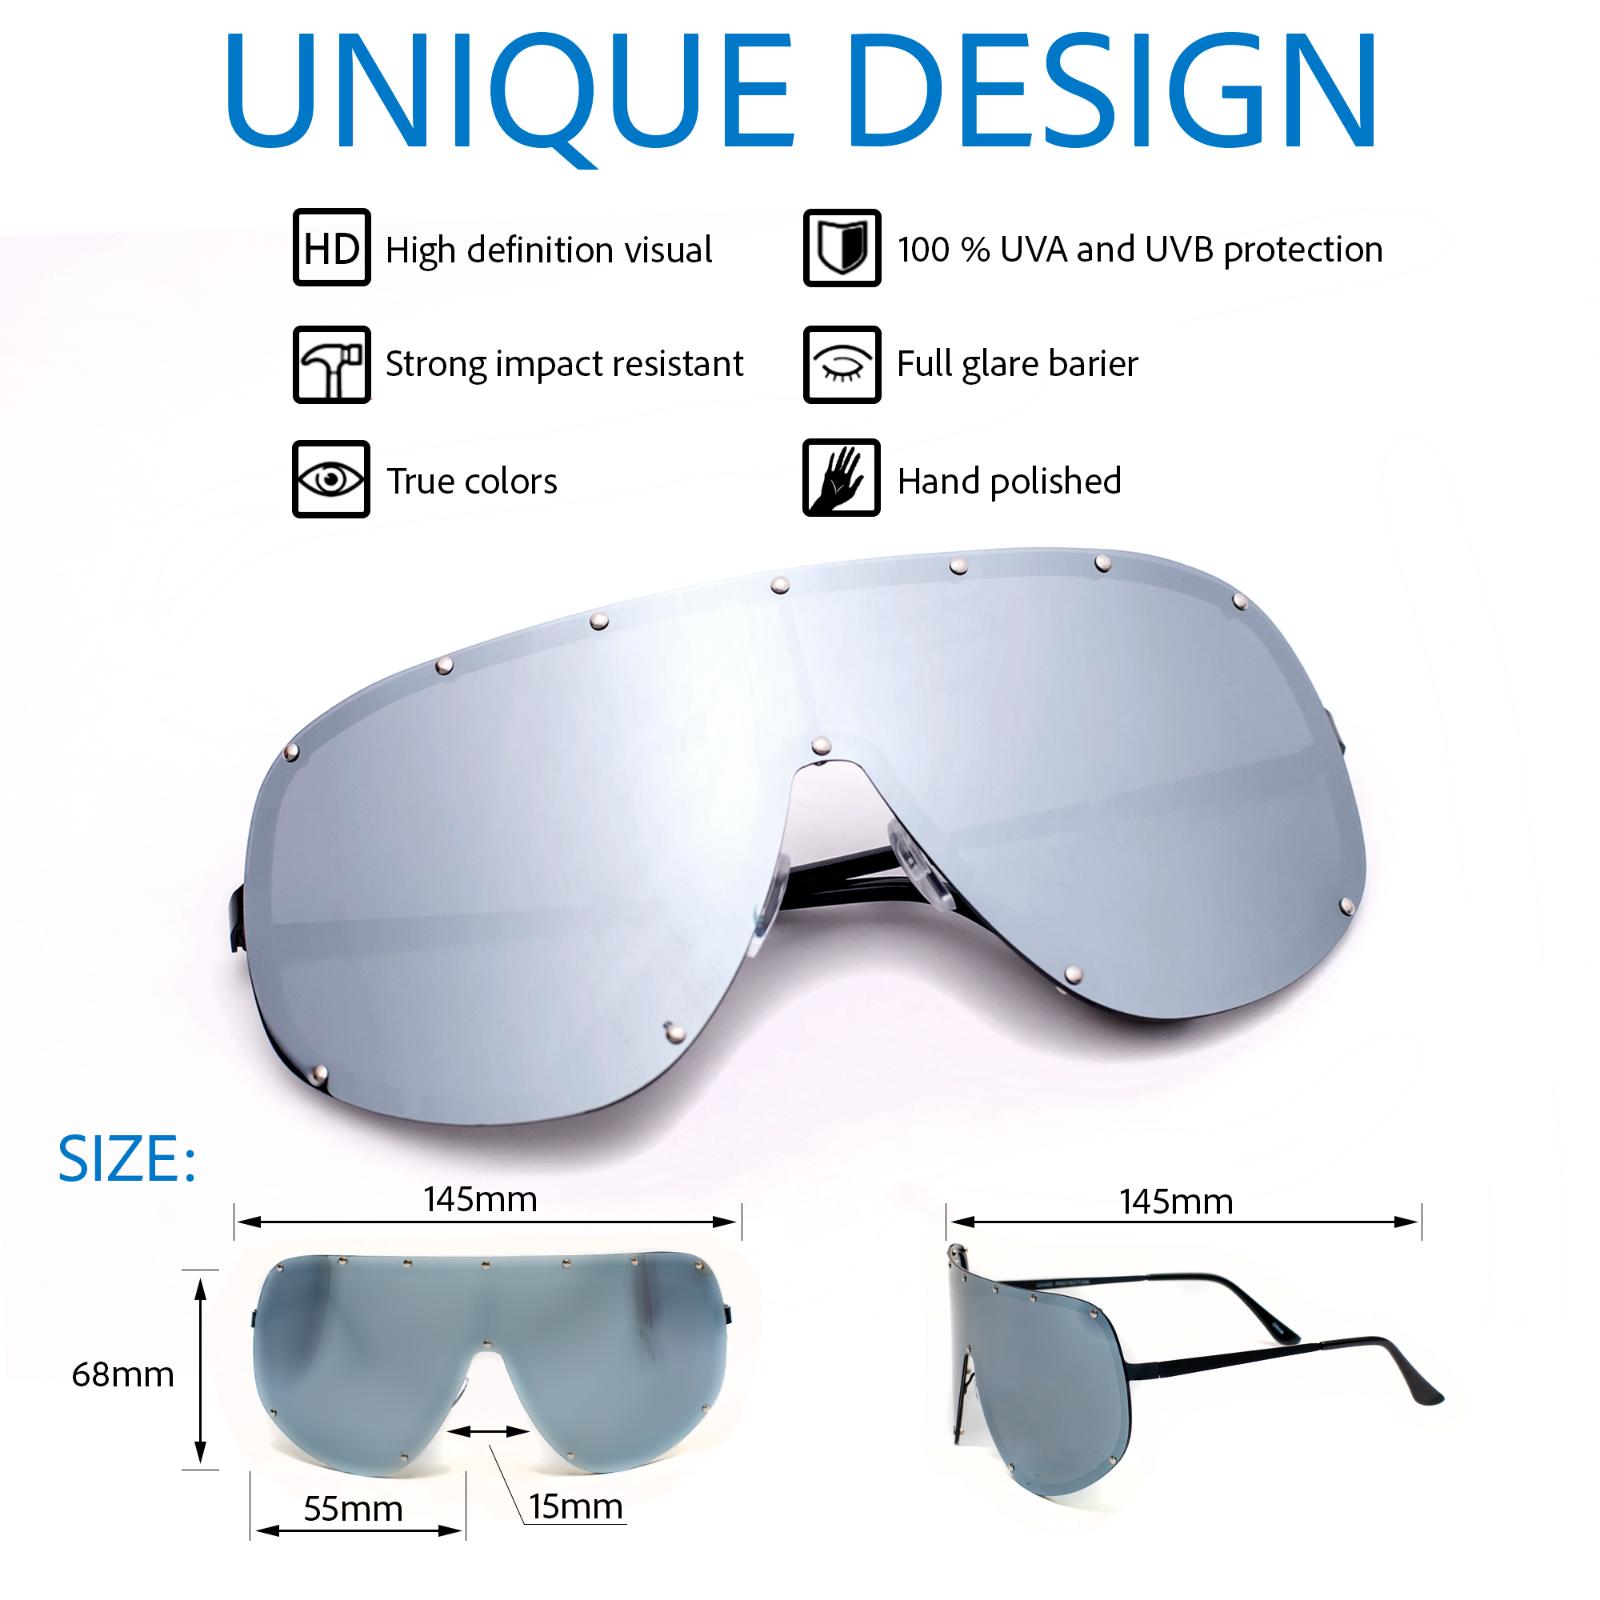 916e68a8886 XXL OVERSIZED Huge Big SHIELD MASK Half Face Owen Polarized Sunglasses  Gafas 2 2 of 12 ...